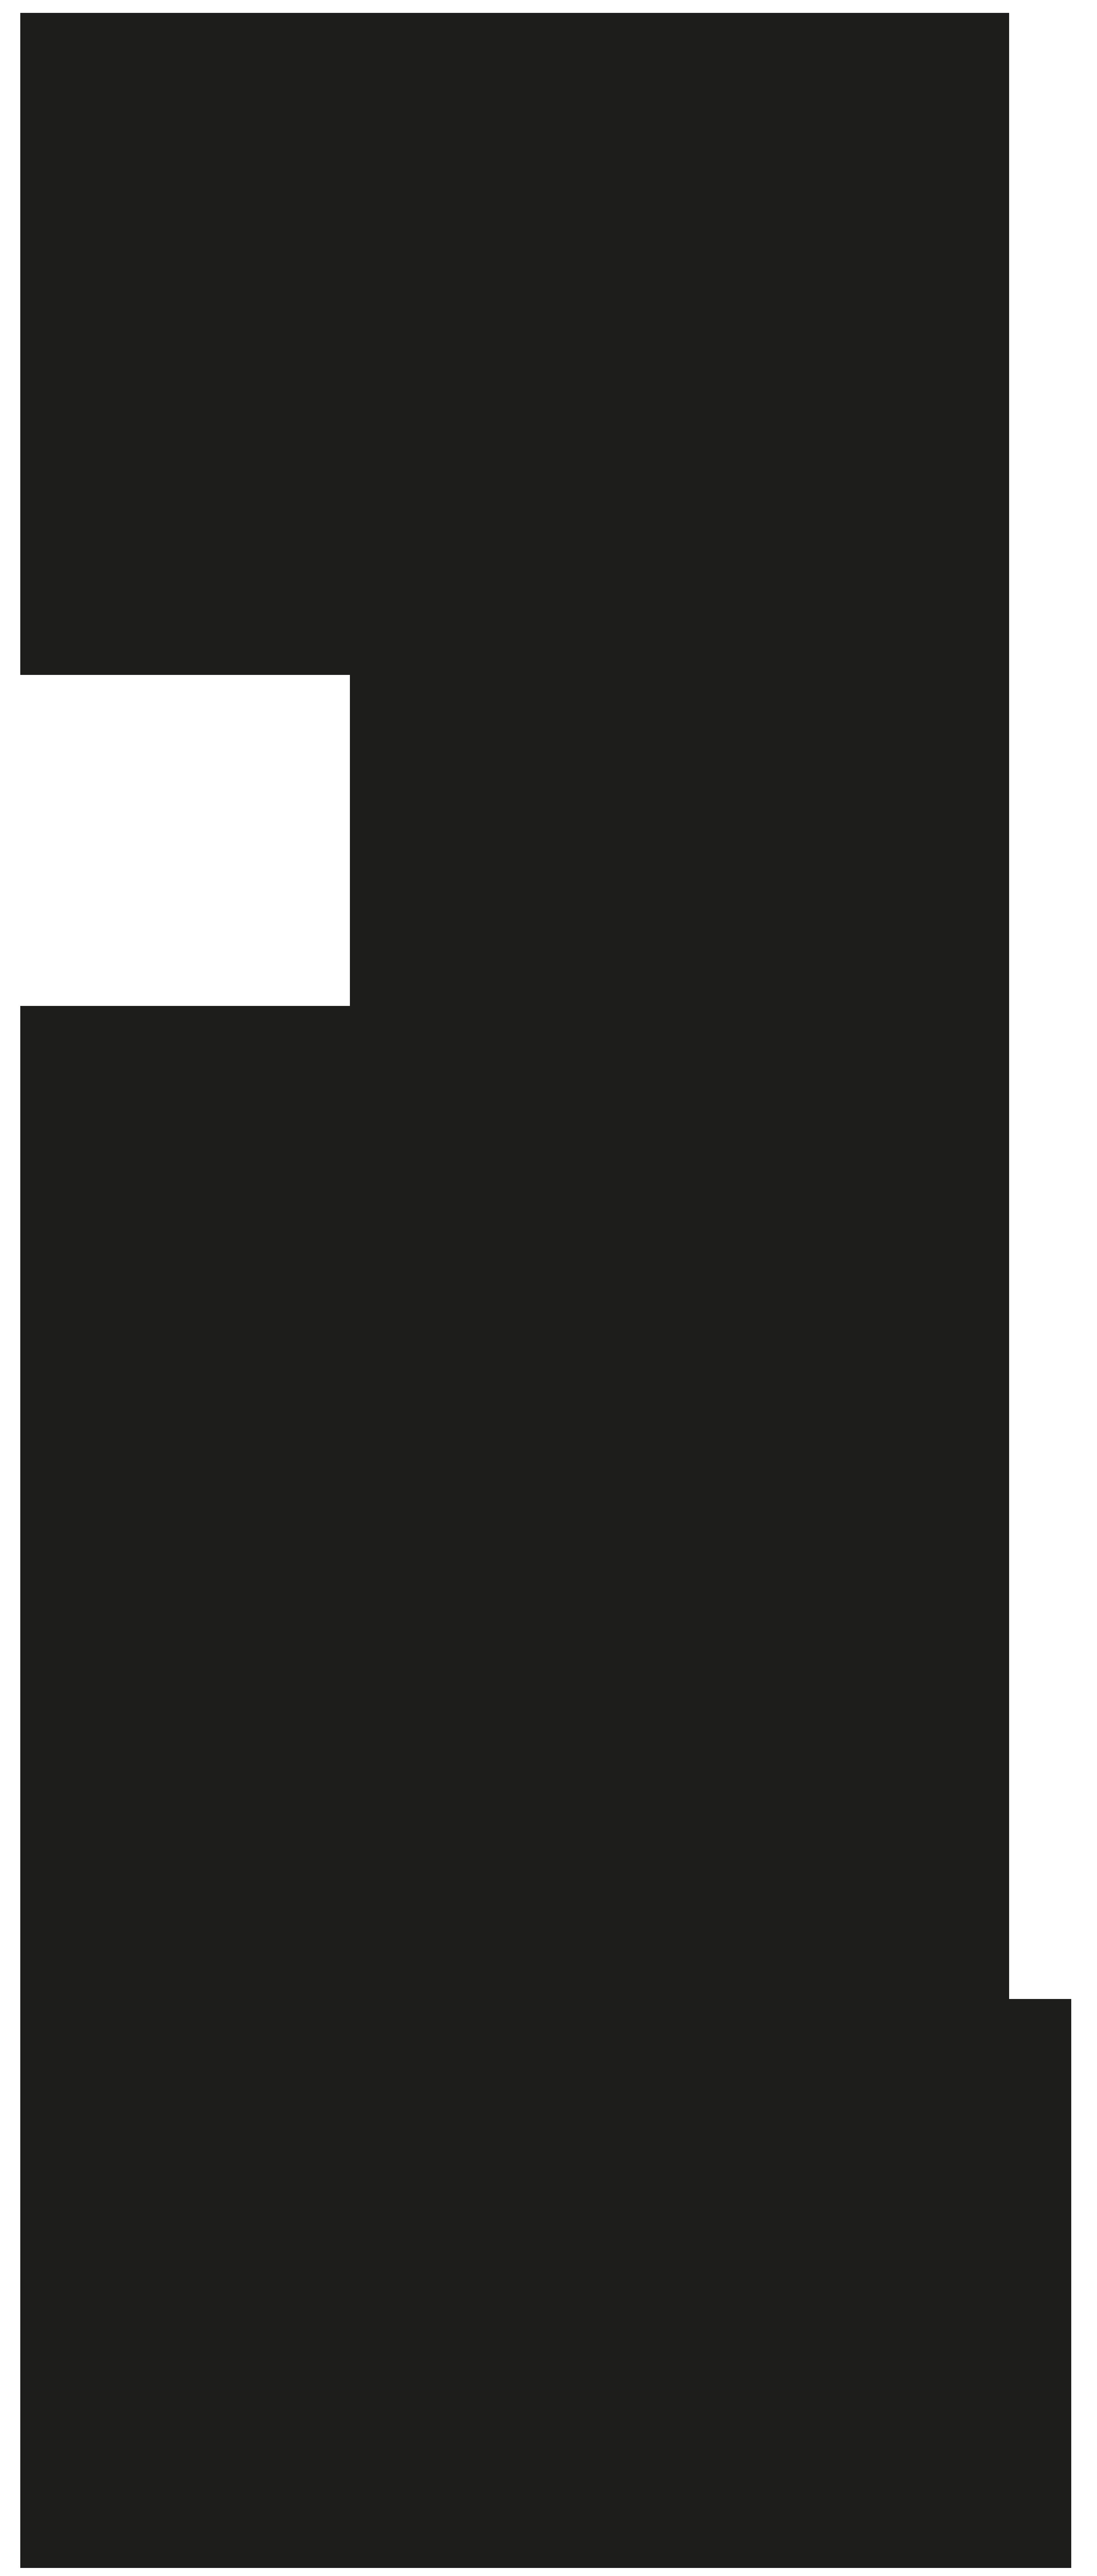 Diamond clipart shading. Cinema camera silhouette png